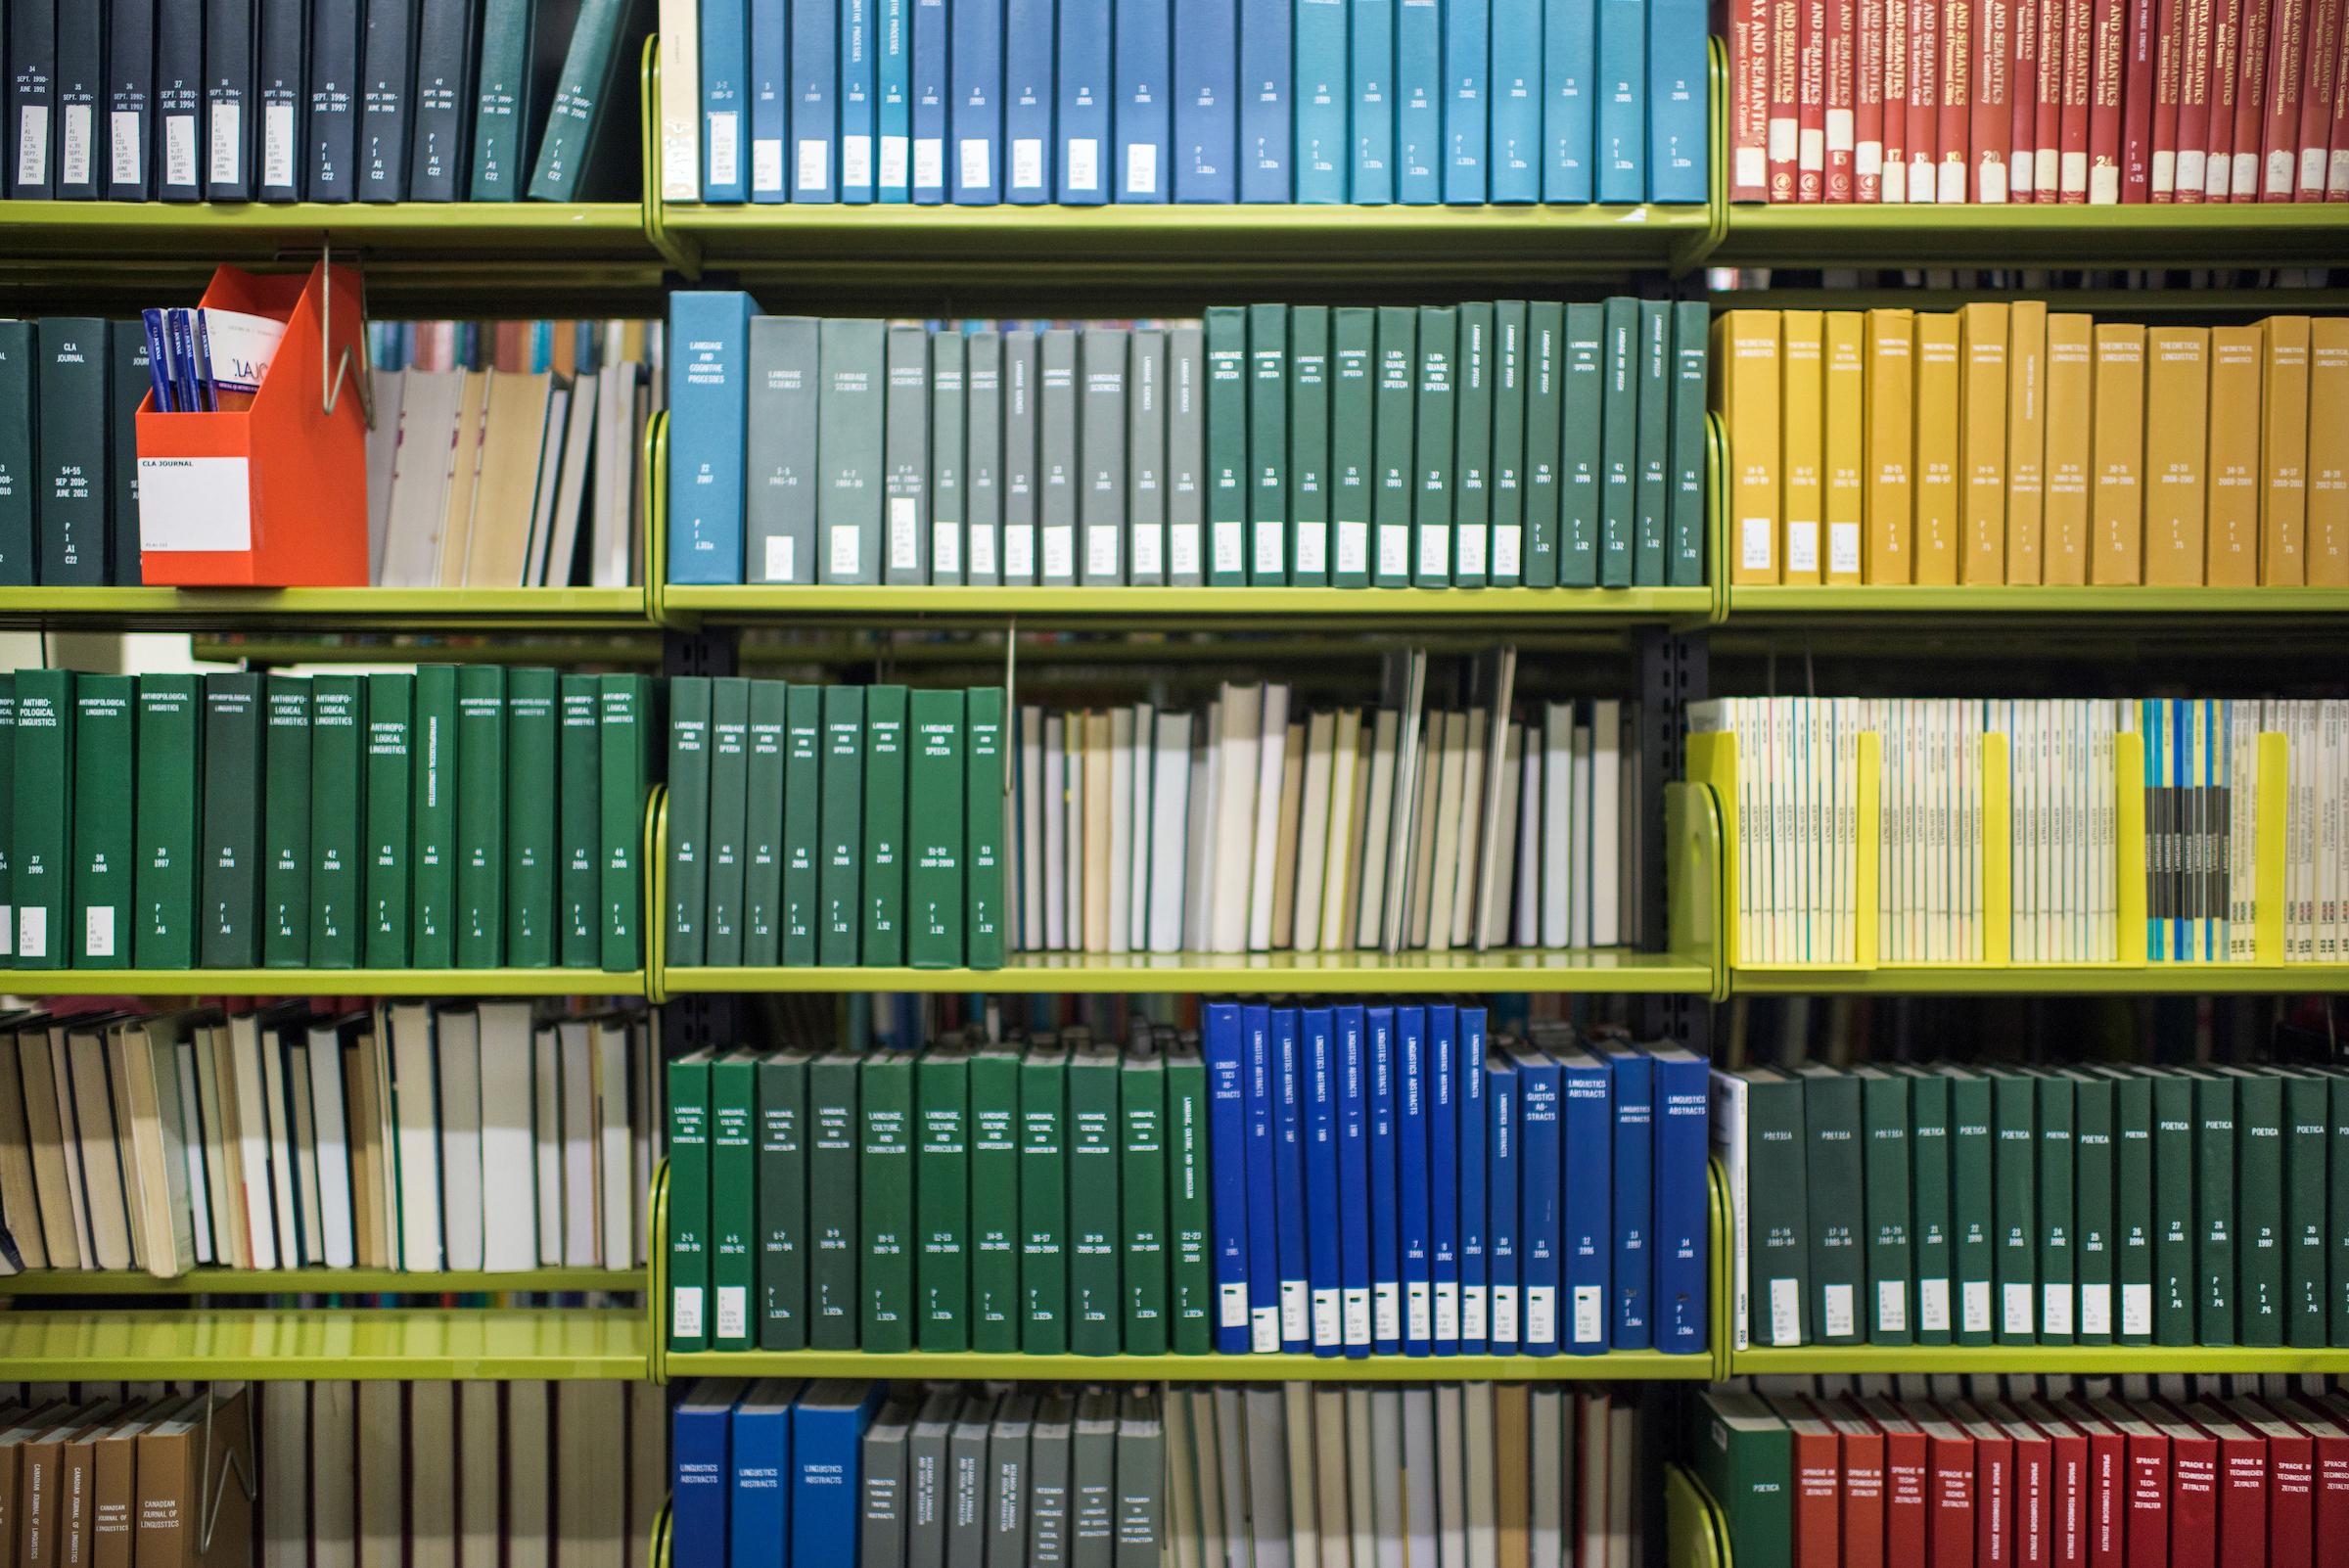 Book Shelf, Alden Library